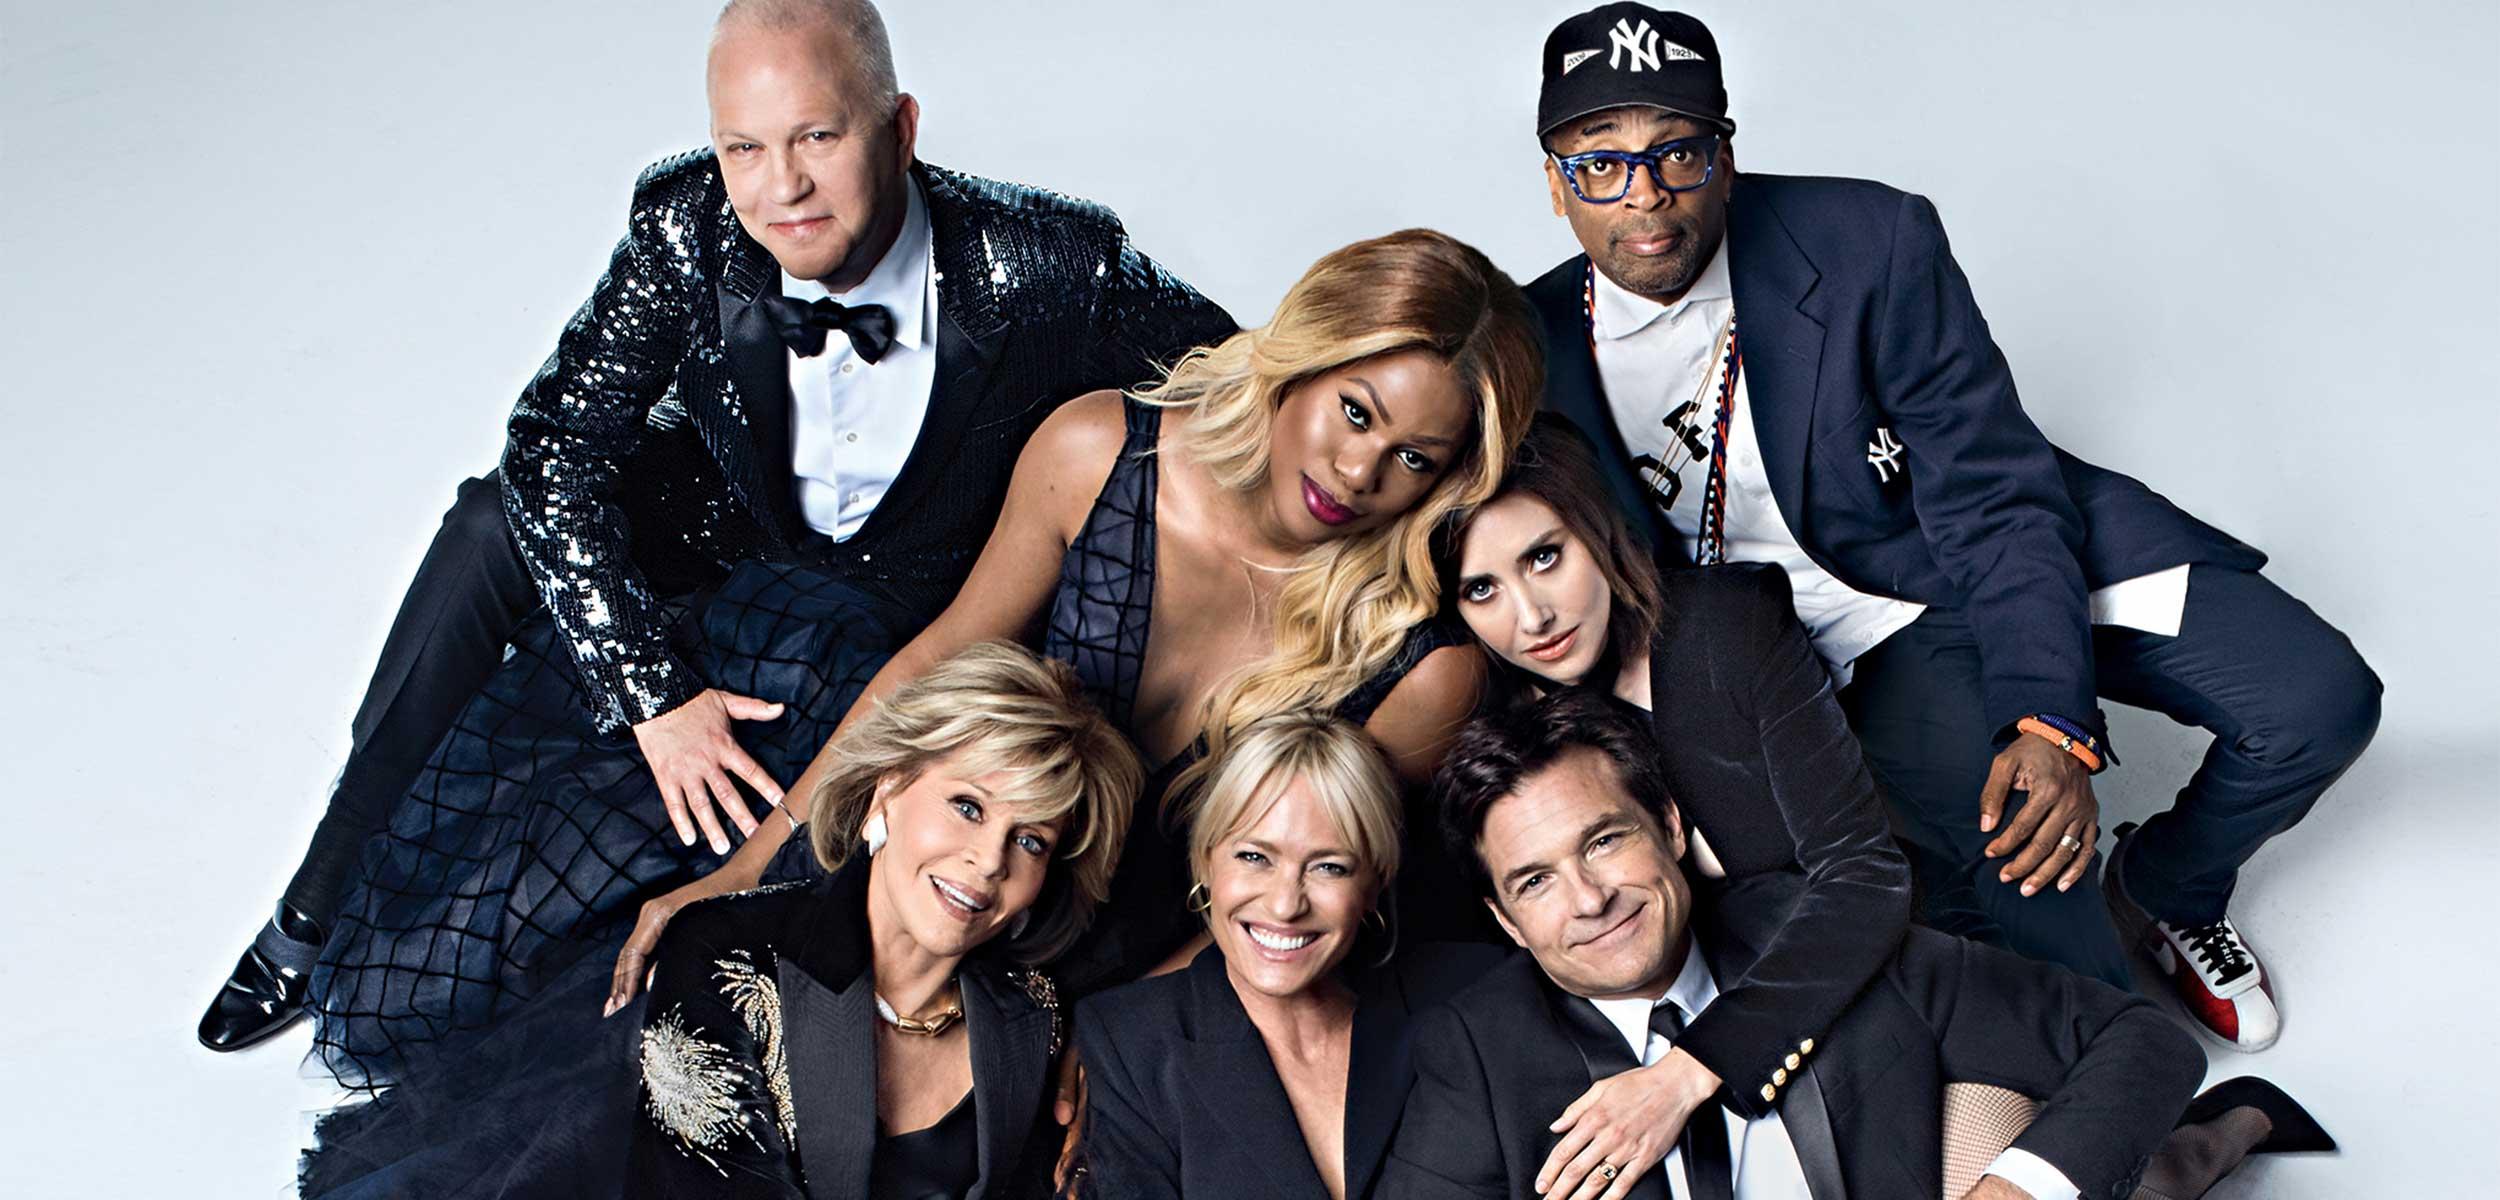 Group portrait of Netflix stars including Ryan Murphy, Spike Lee, Jane Fonda, Robin Wright and others.